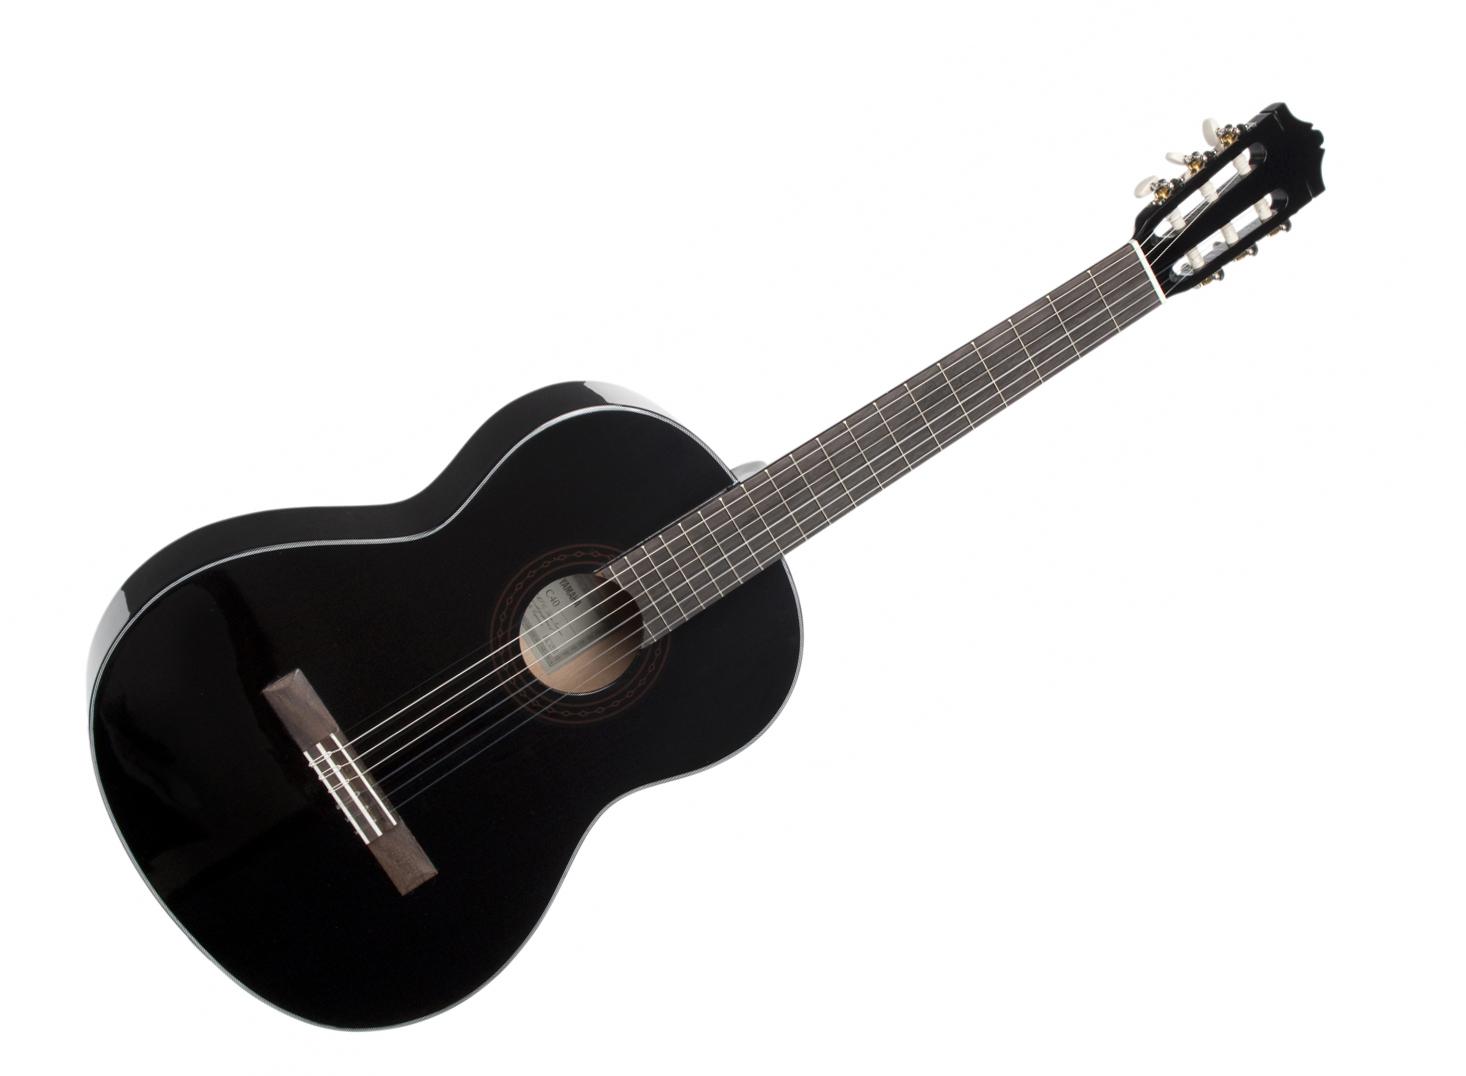 dating yamaha clasic chitare